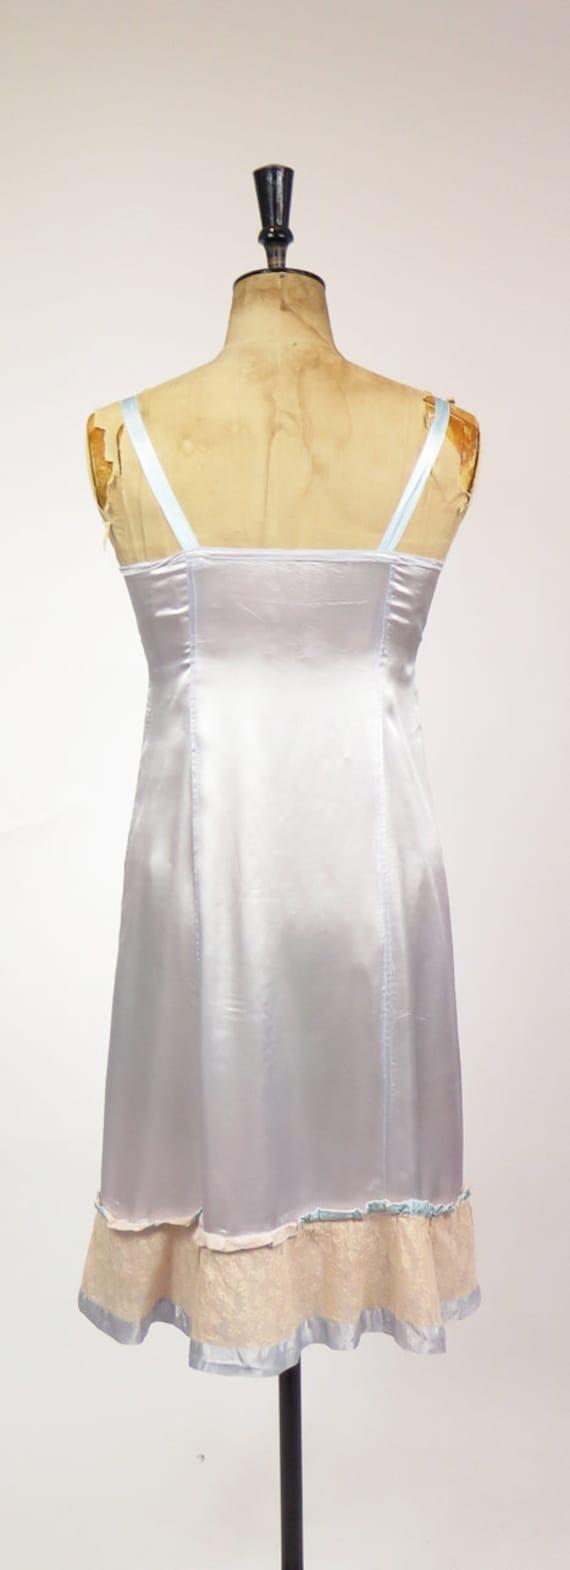 Original Vintage 1940-50s Dusky Blue Nude Lace Sl… - image 2